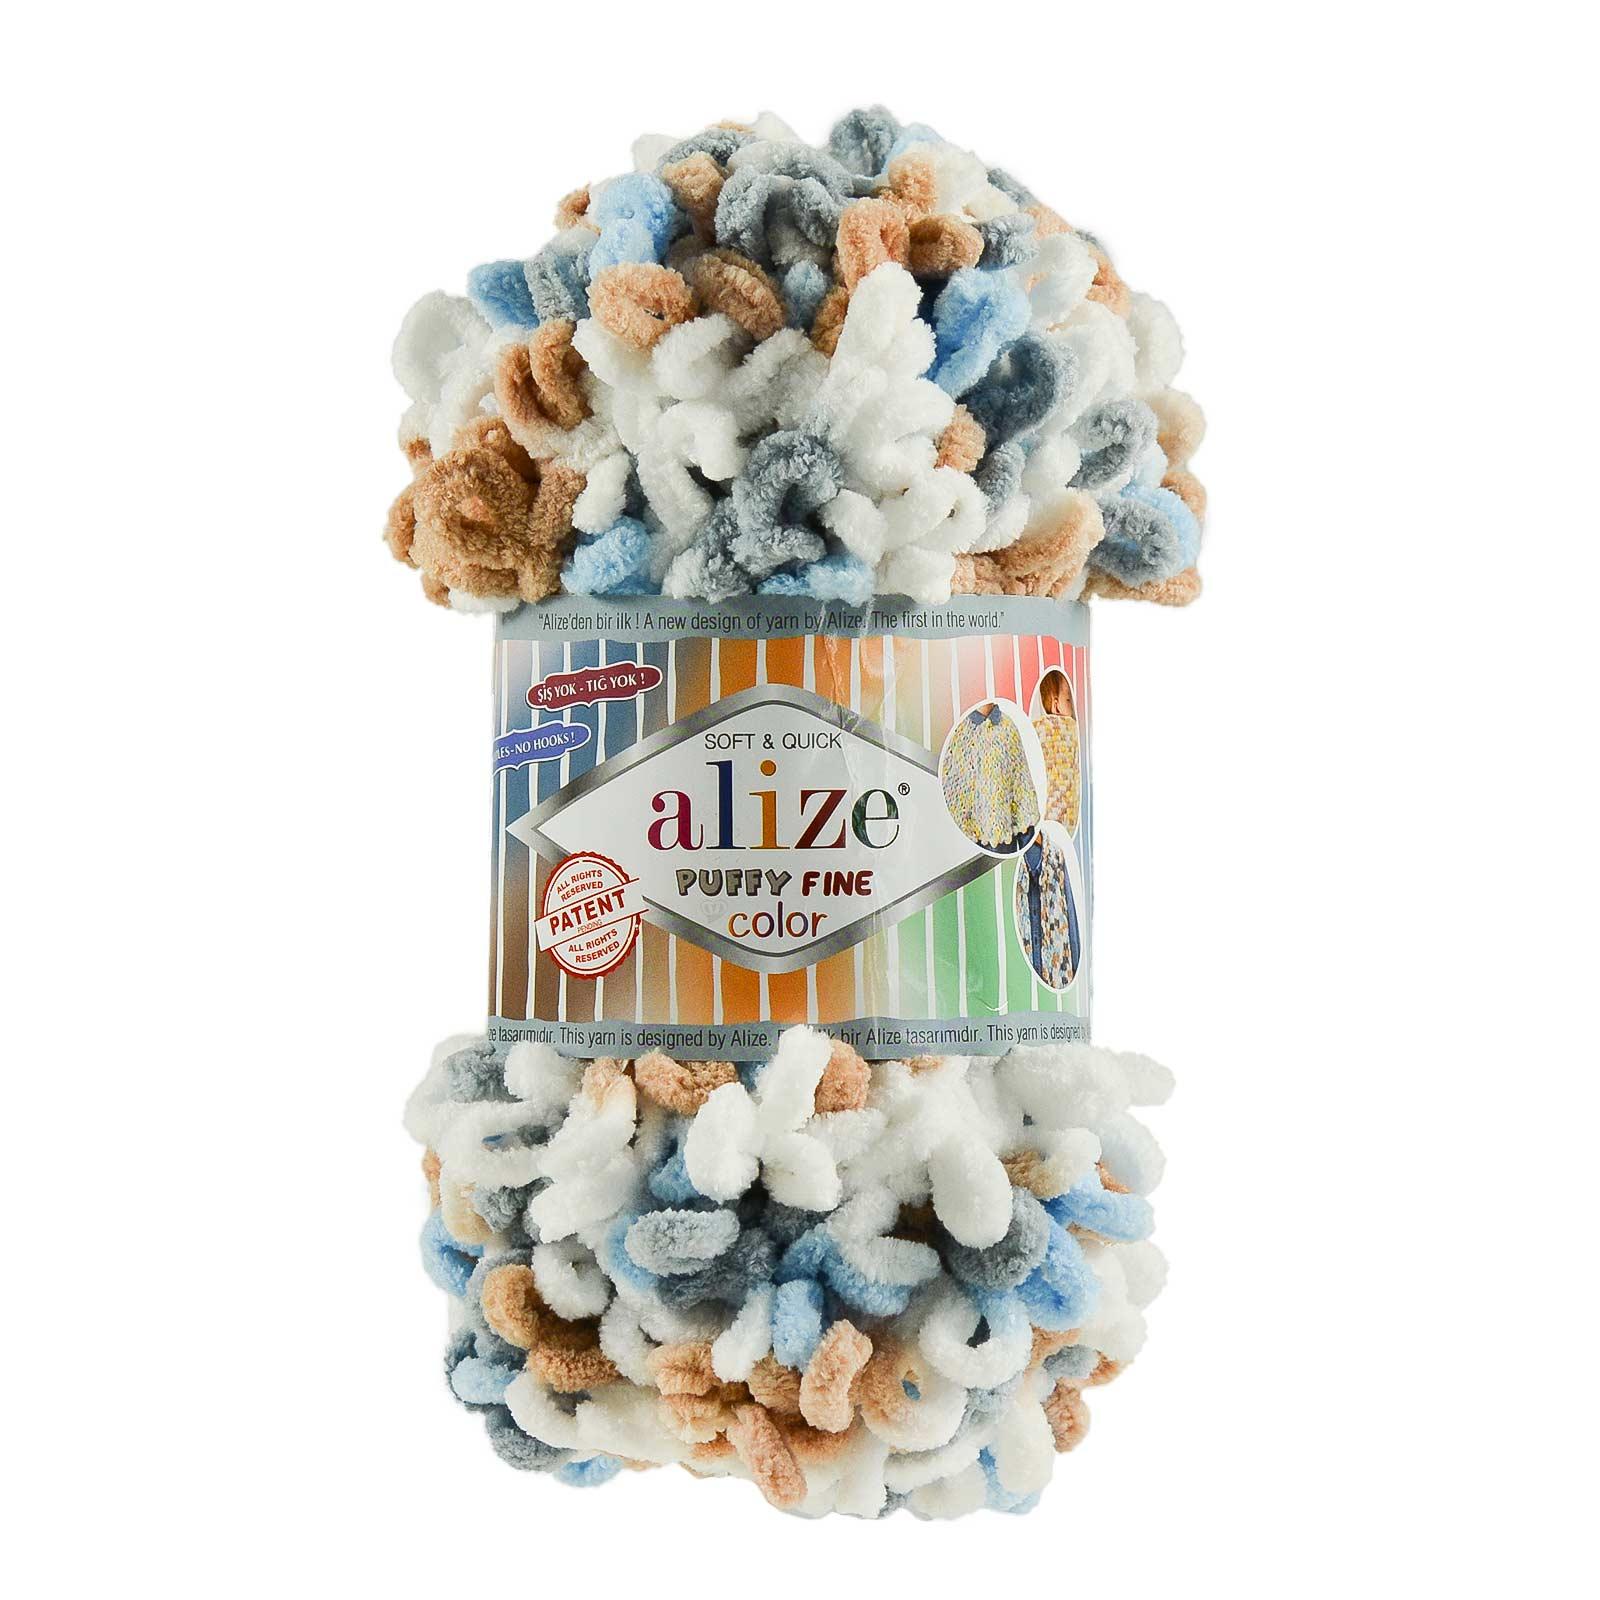 100g Strickgarn ALIZE Puffy Fine Color, Fingerstrick Fingerstrick-Wolle ohne Nadel – Bild 2